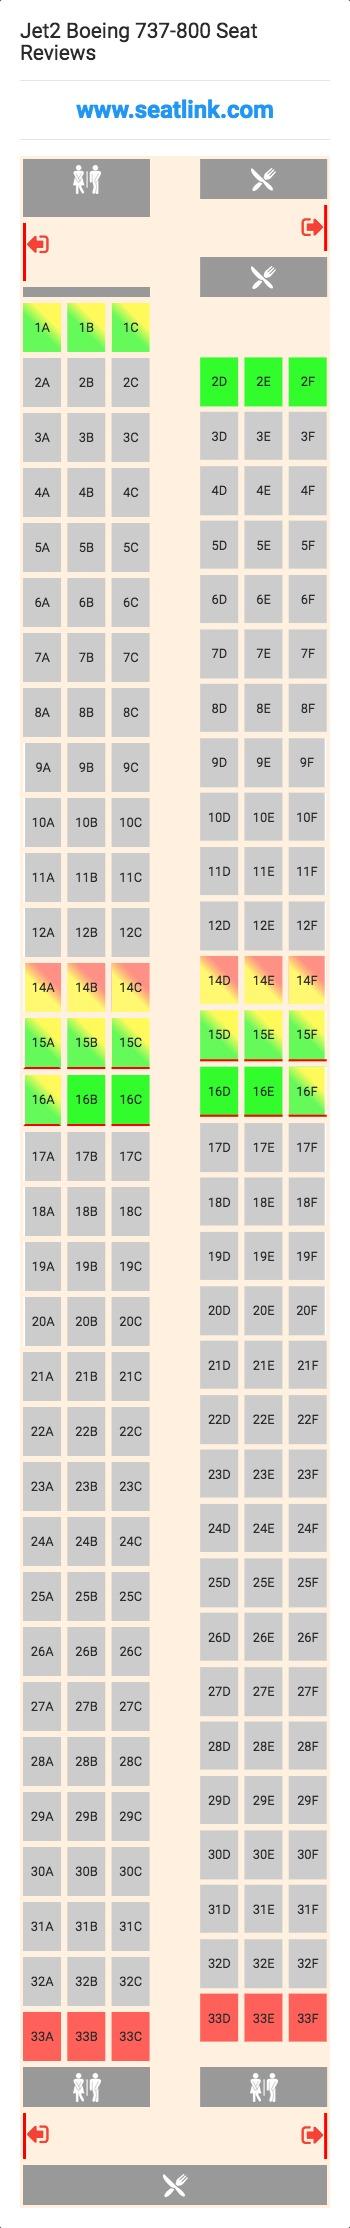 Jet2 Boeing 737 800 Seating Chart Updated September 2019 Seatlink